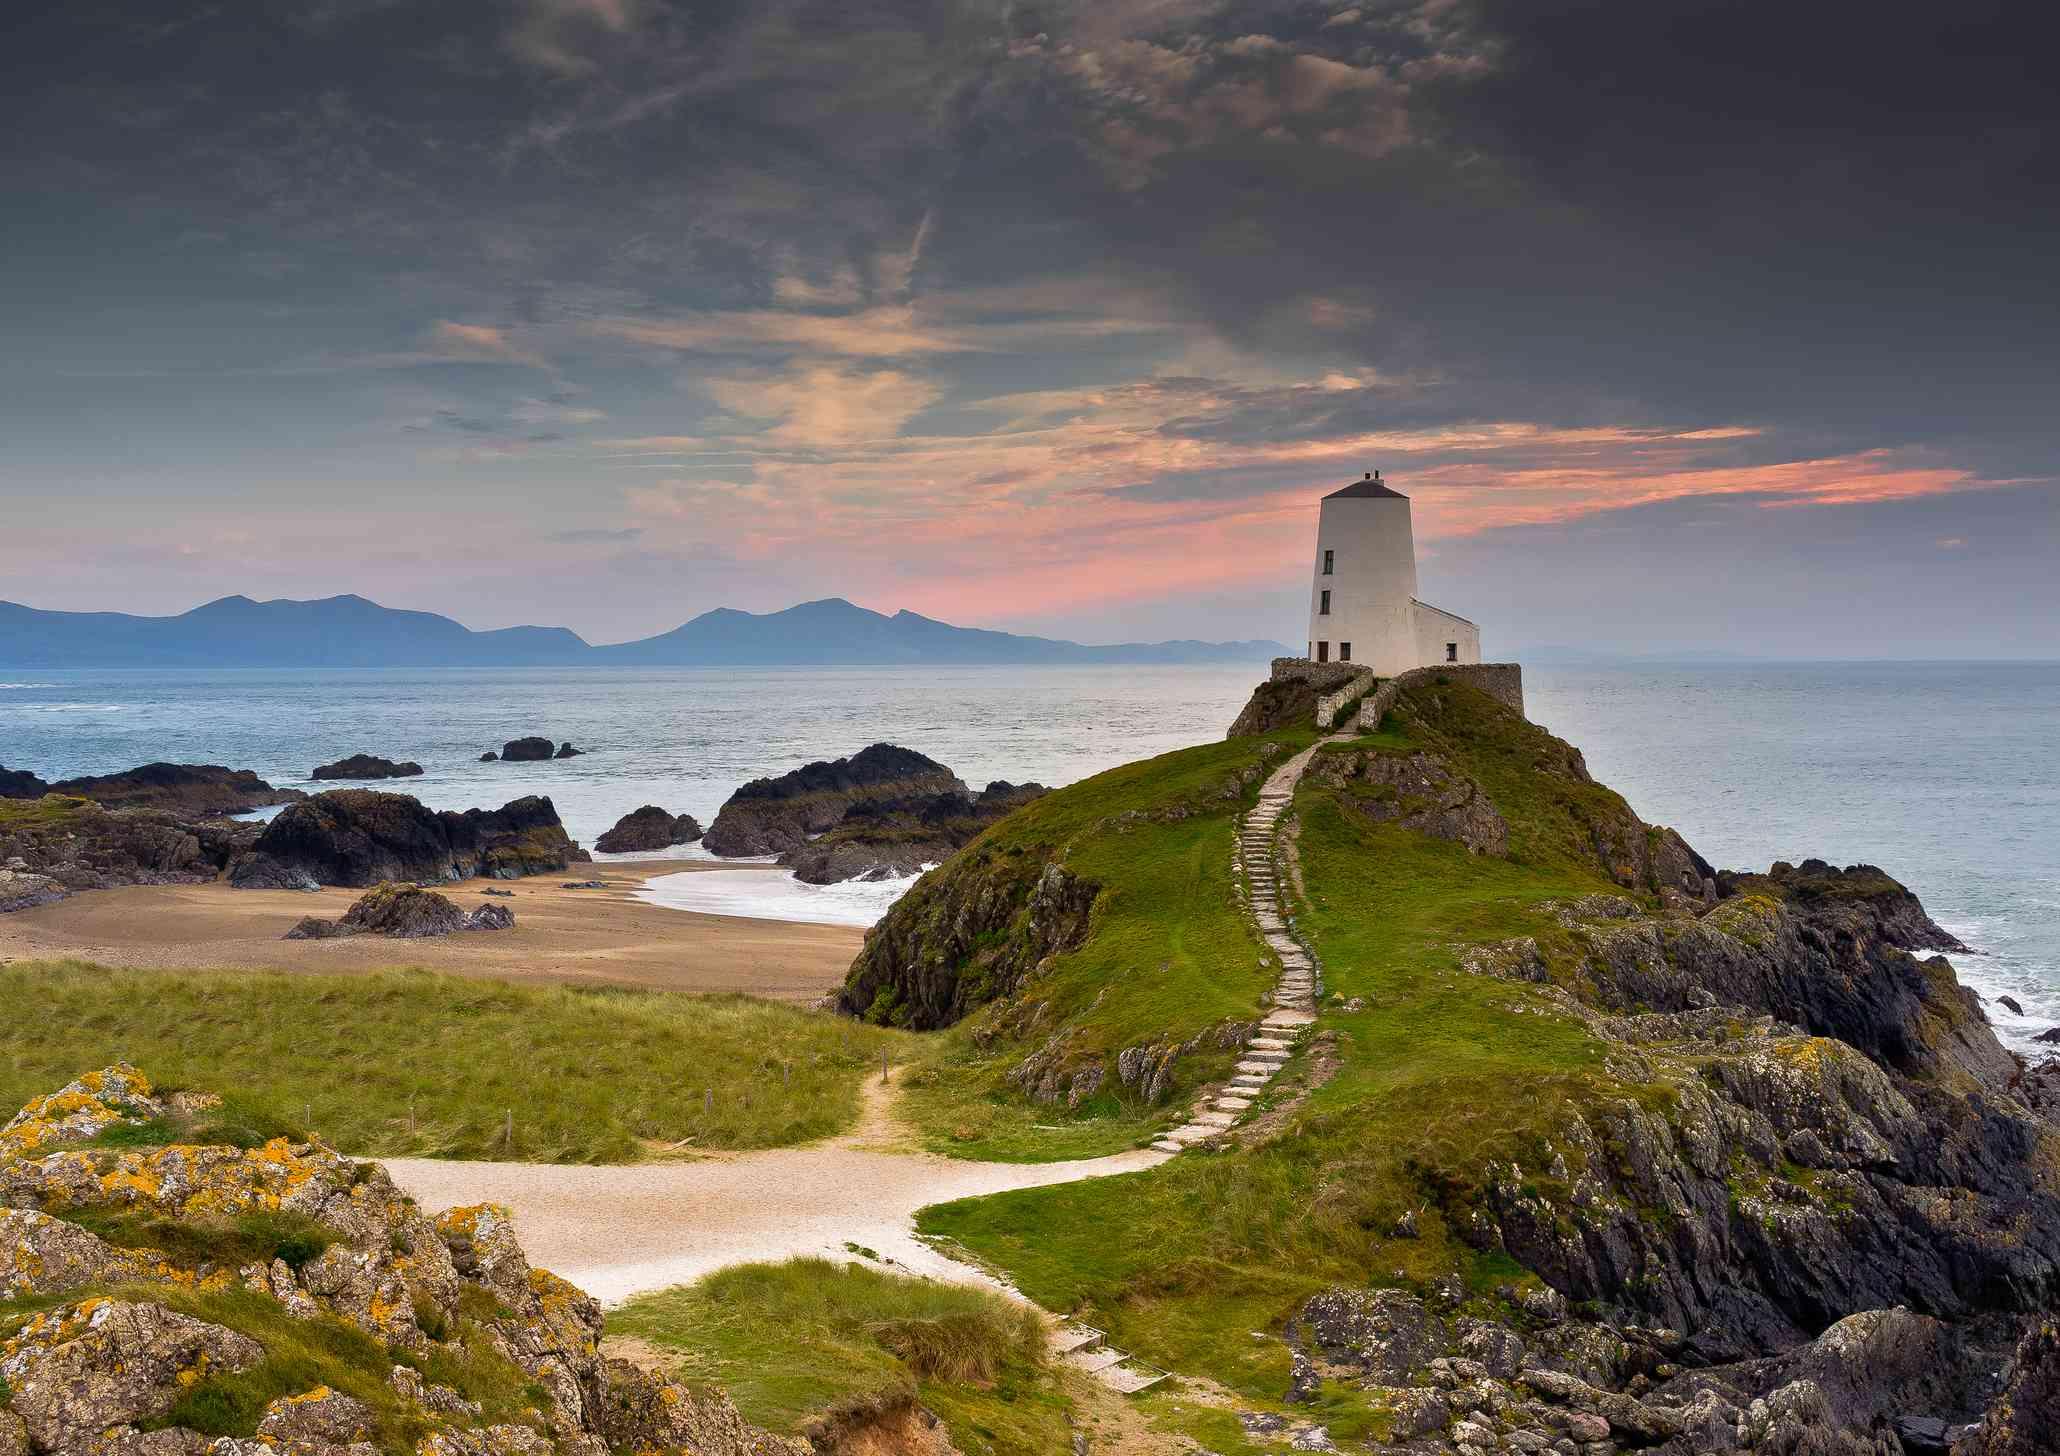 Llanddwyn Lighthouse on Anglesey